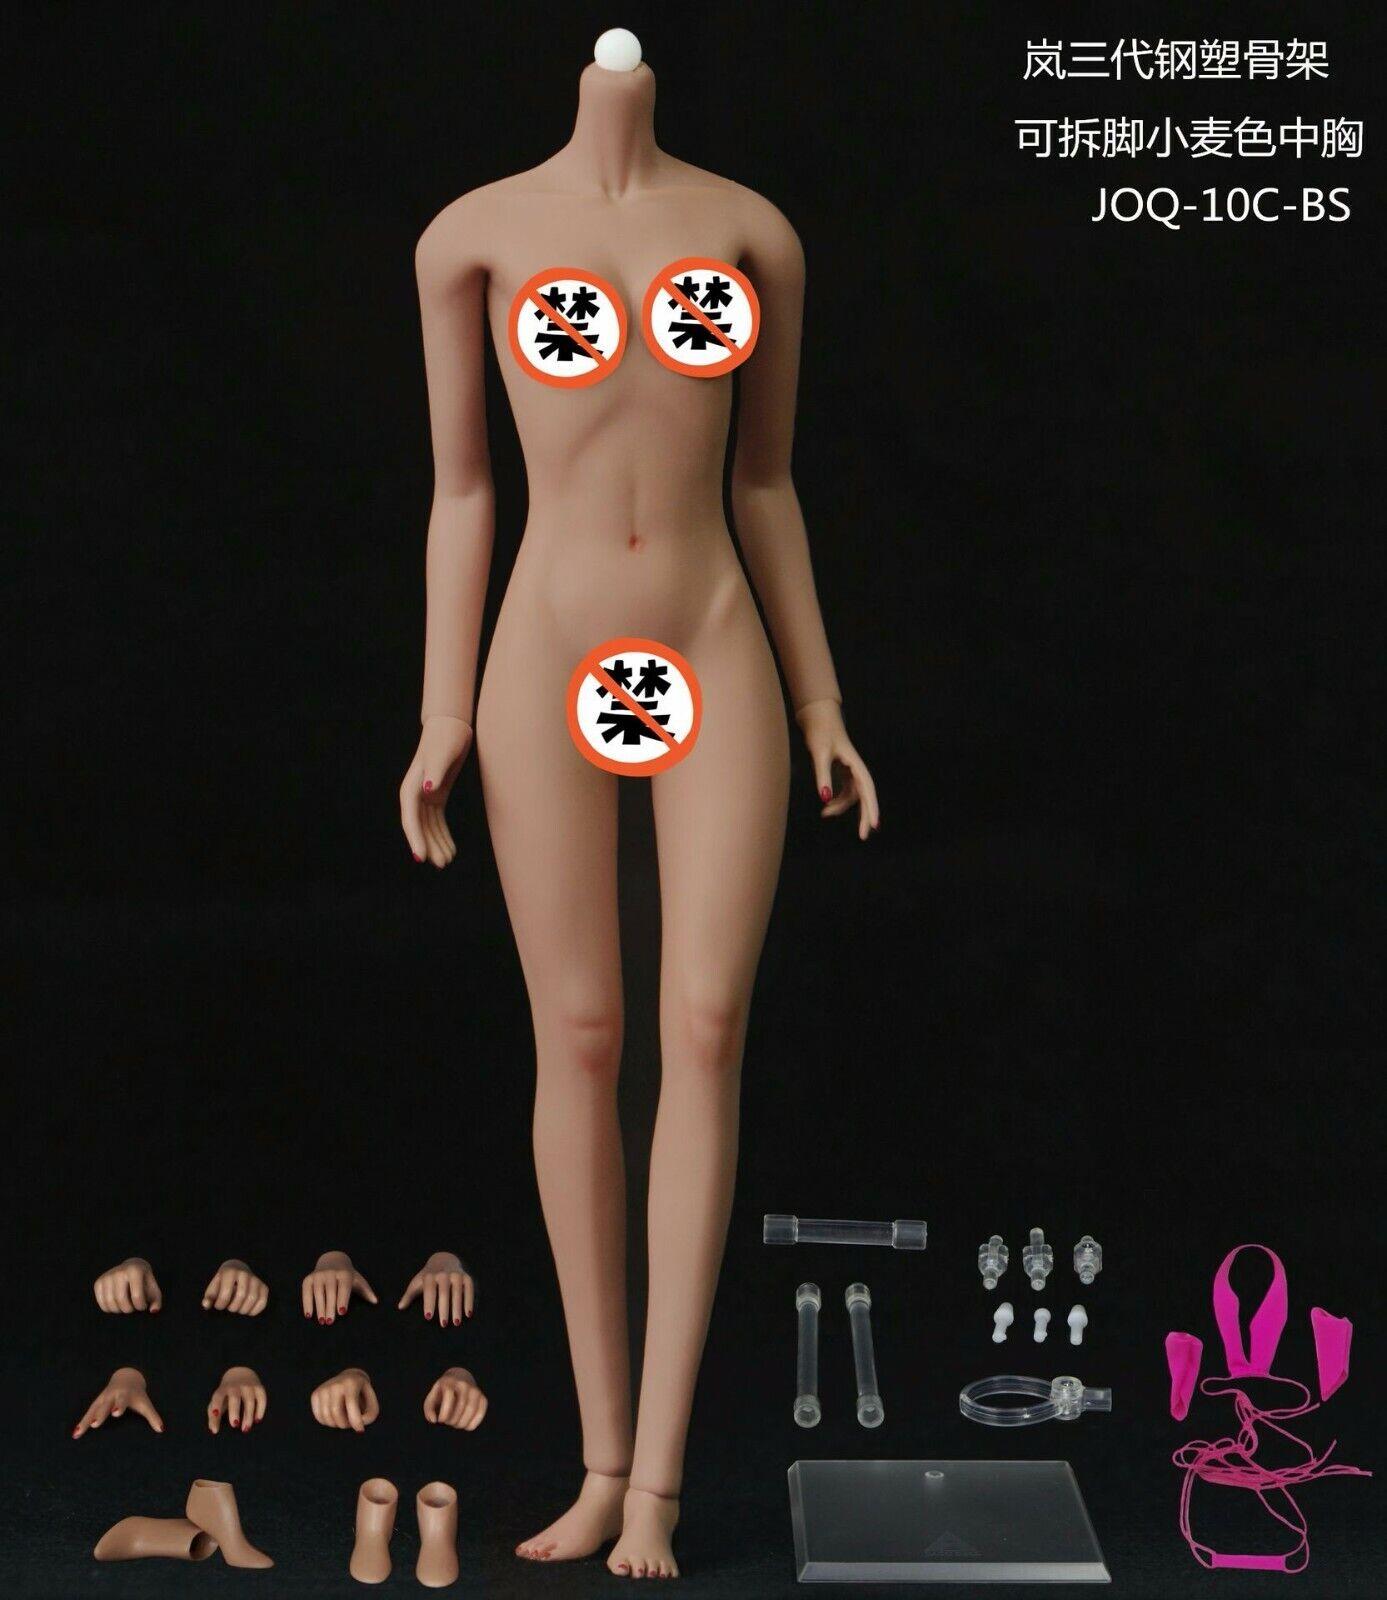 JIAOU bambola 1 6 Suntan Skin Female corpo JOQ-10C-BS JOQ-10C-BS JOQ-10C-BS 12'' Mid autobust Detachable Feet d2926d